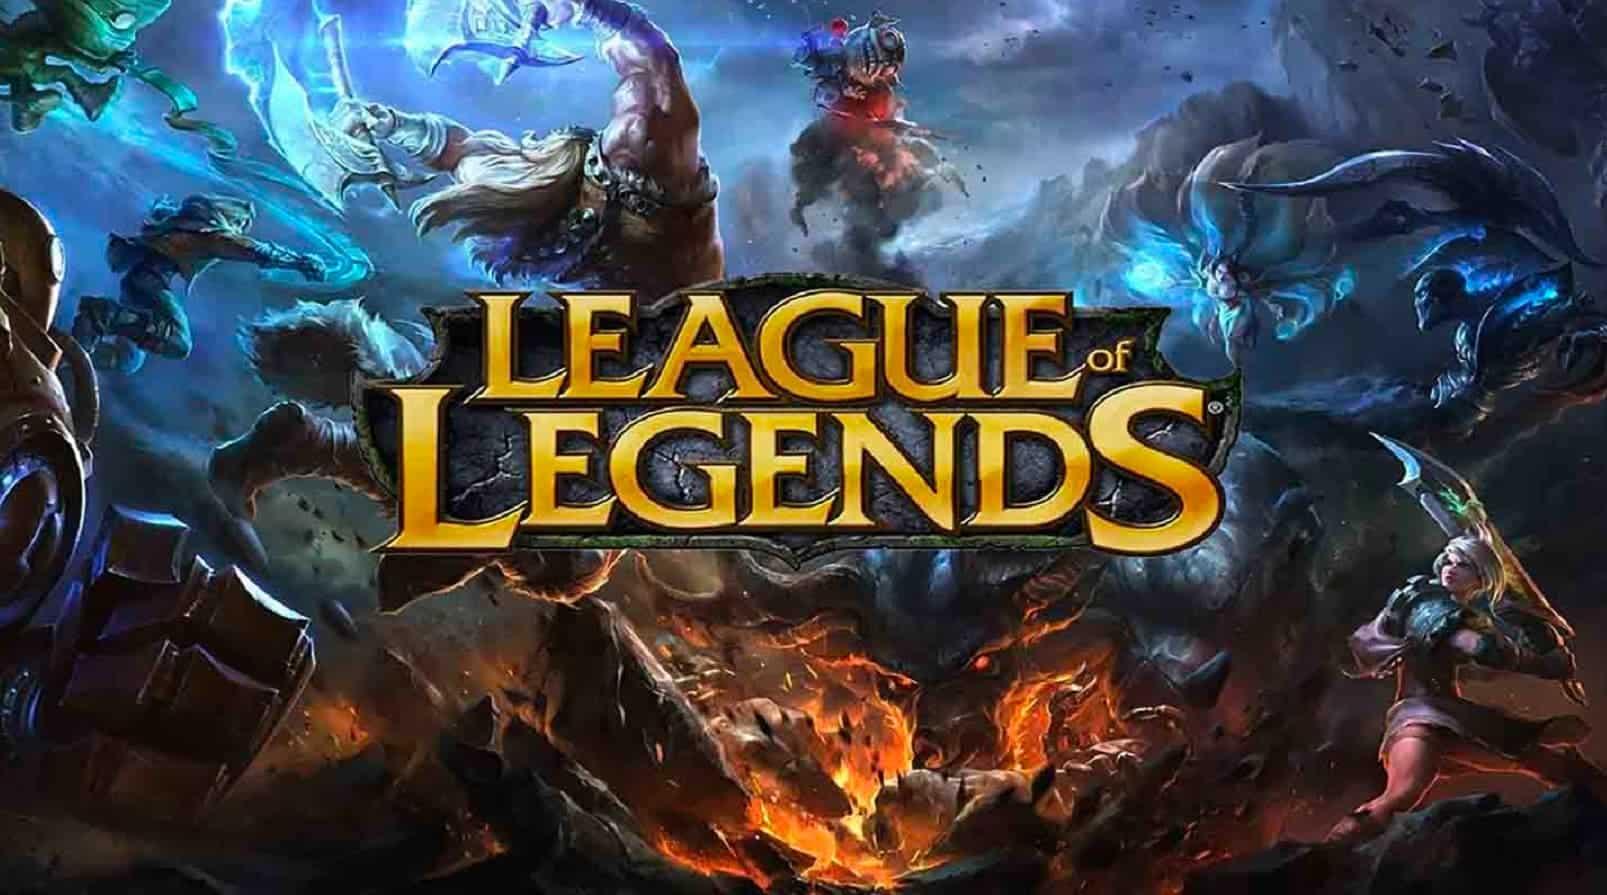 League of Legends Skinsplitter [Twitch Prime]